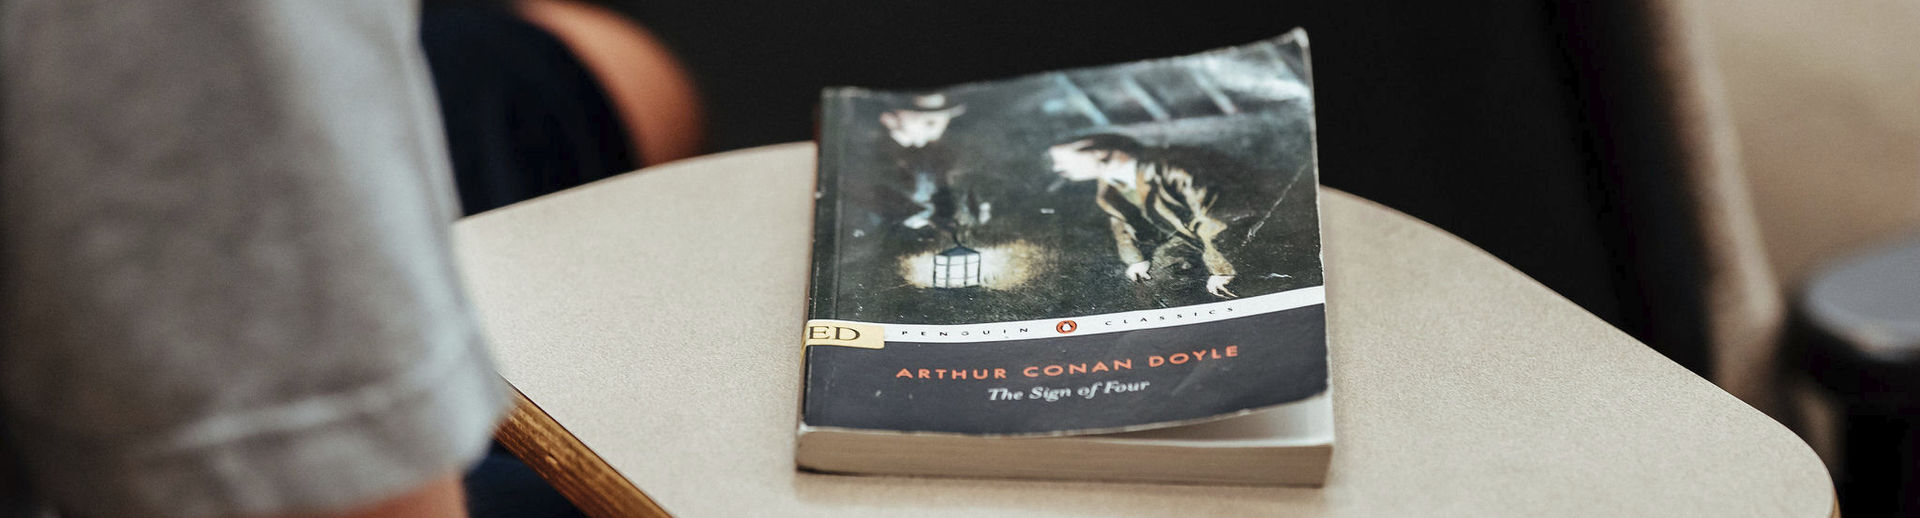 Close up a novel by Arthur Conan Doyle.